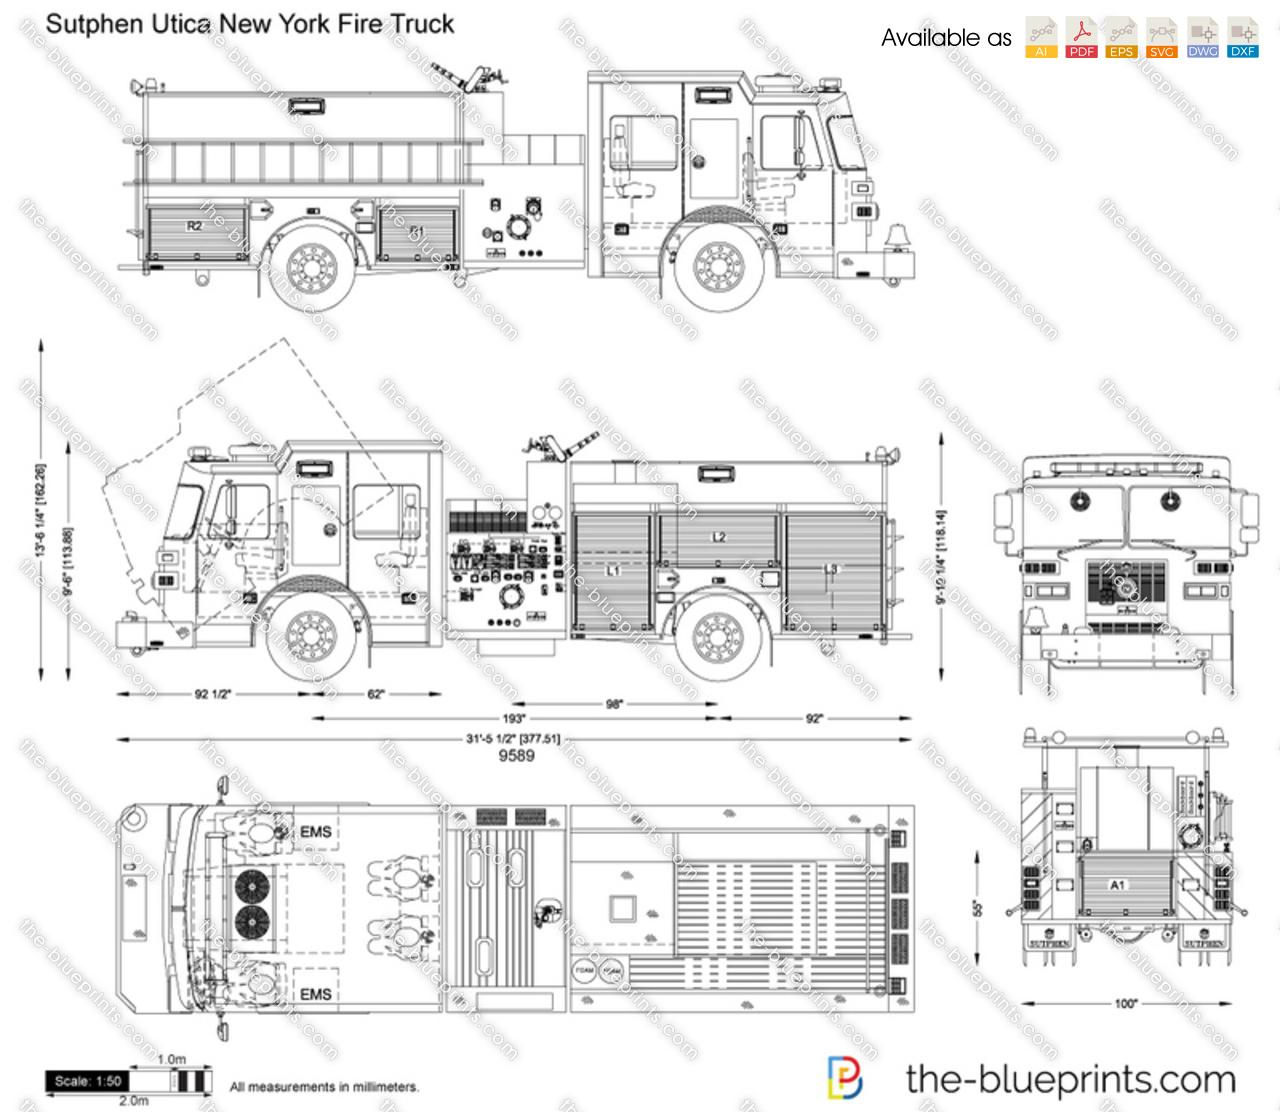 Fire Truck Diagram Trusted Wiring Diagrams Pierce Engine Pump Sutphen Utica New York Vector Drawing Schematic